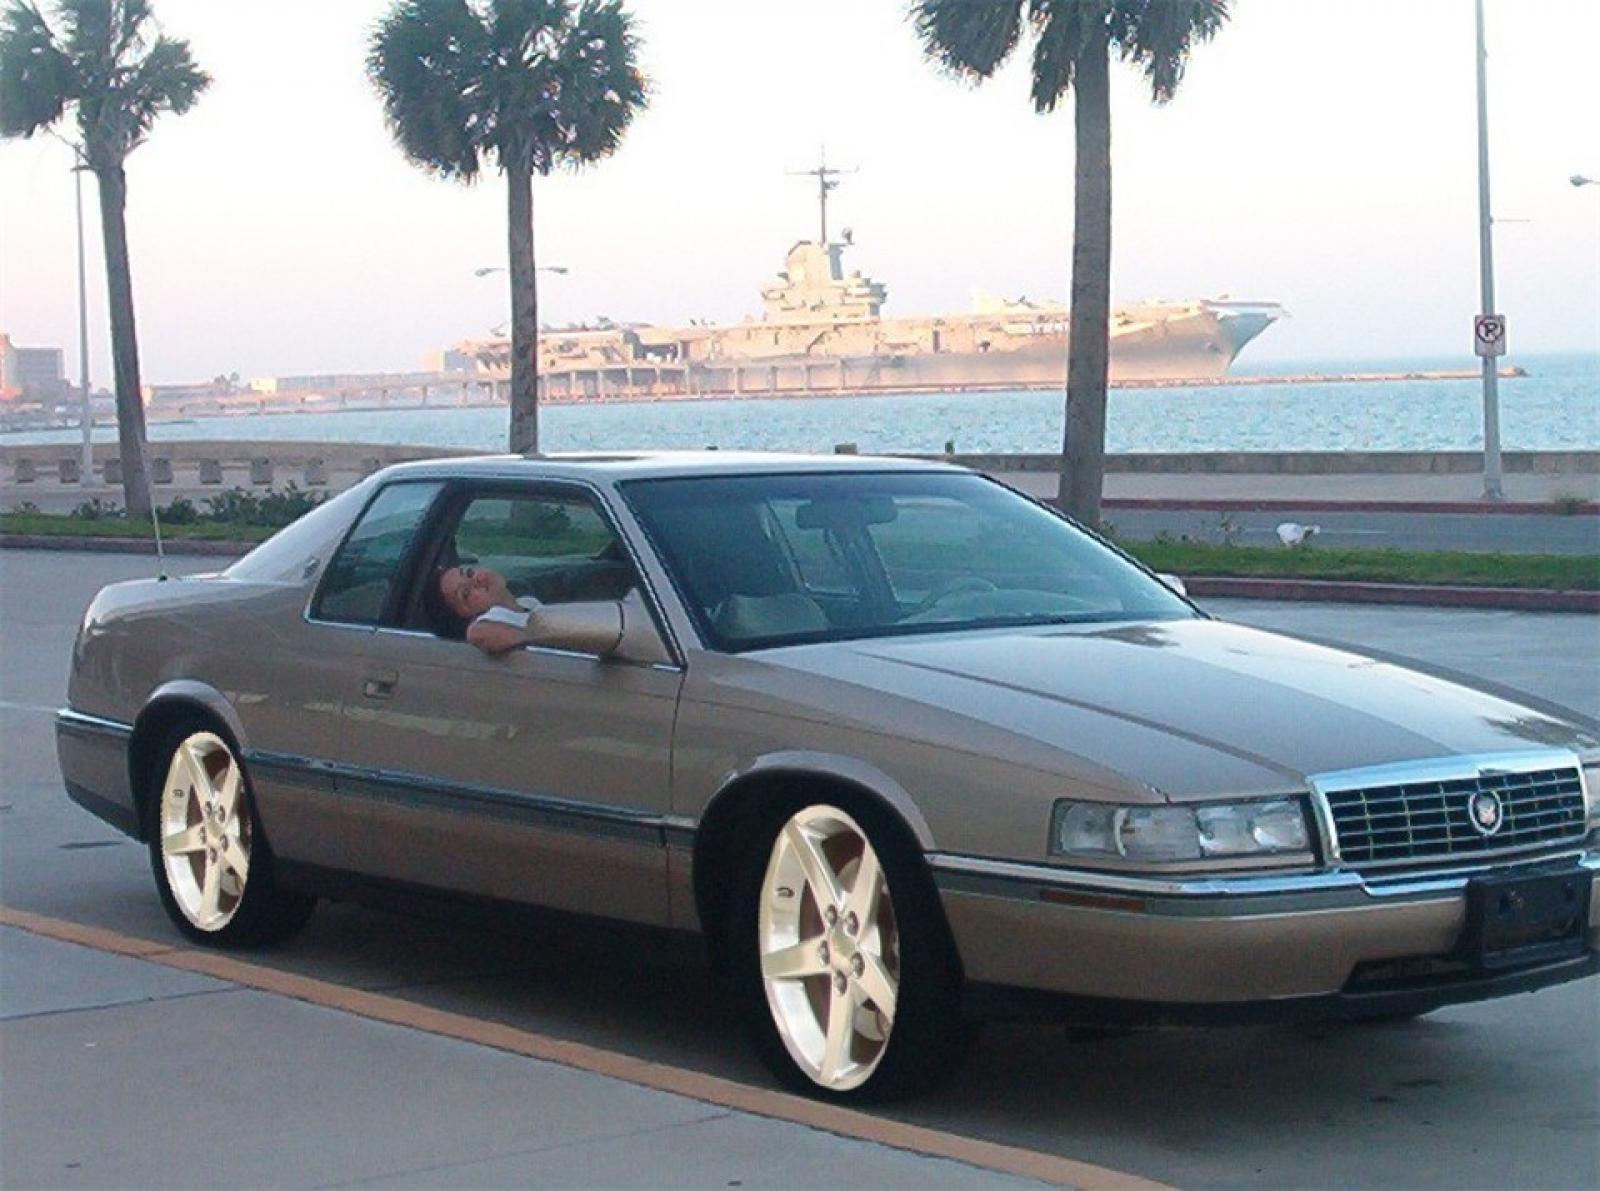 94 Cadillac Eldorado Wiring - Trusted Wiring Diagrams